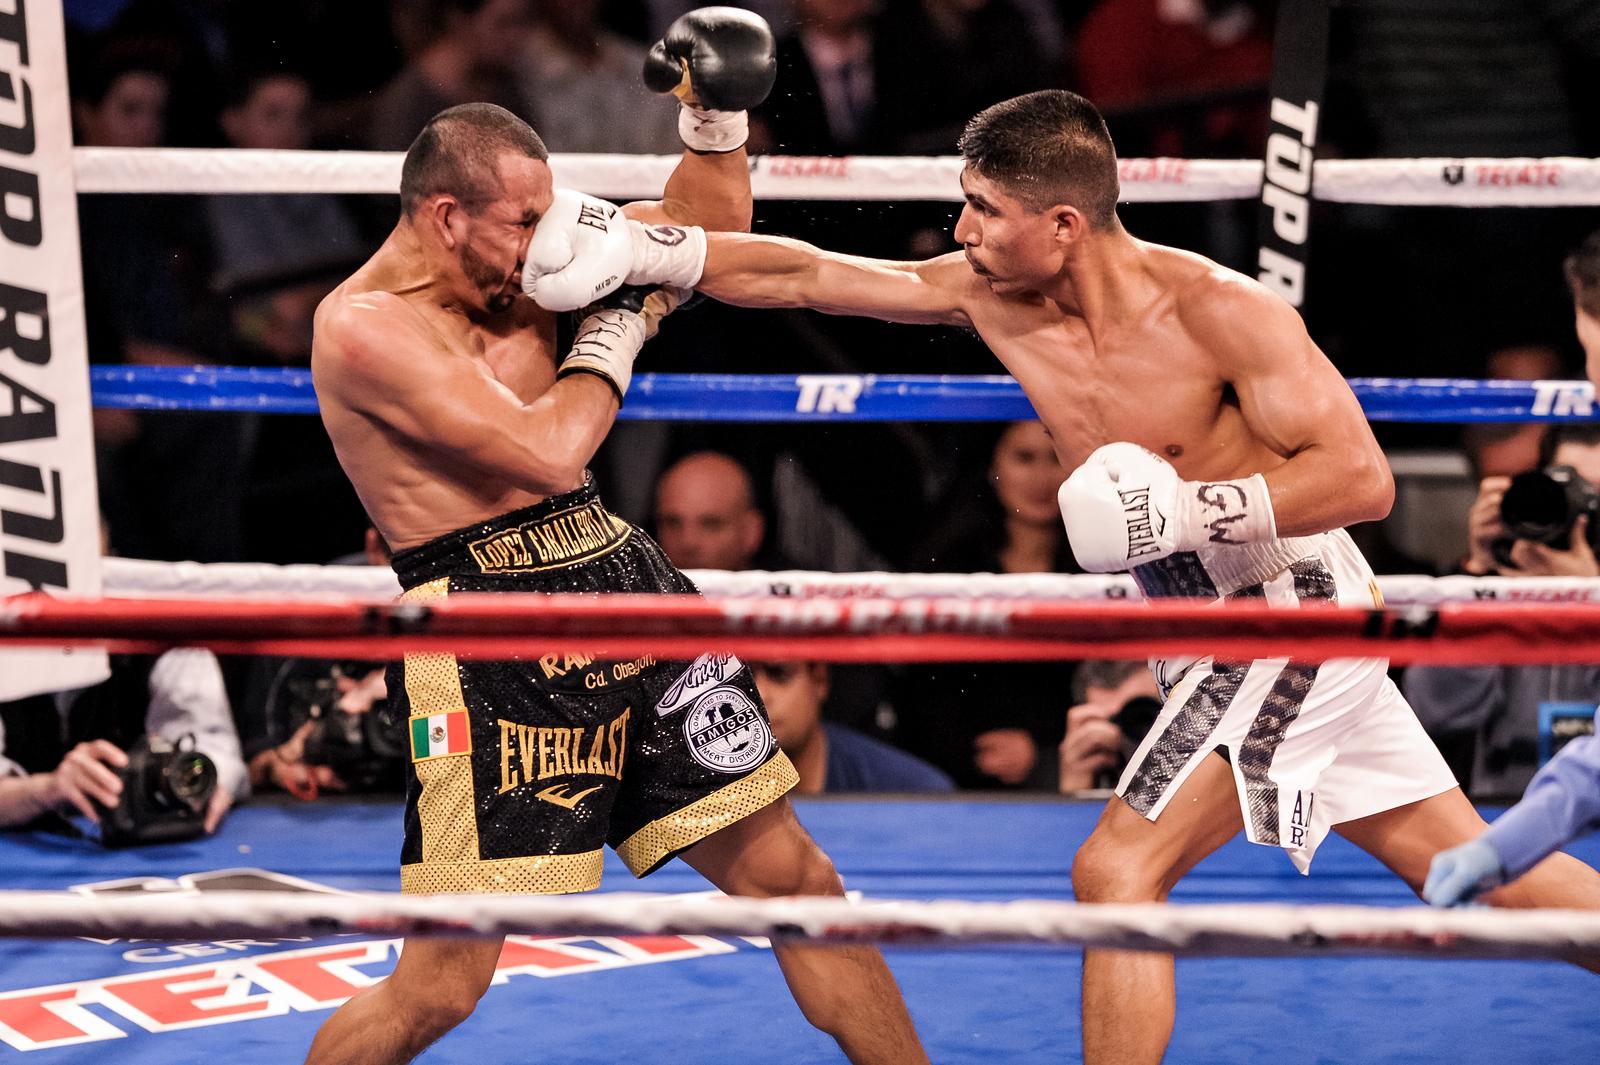 BOXING 2013 - MIiguel Garcia vs Orlando Salido